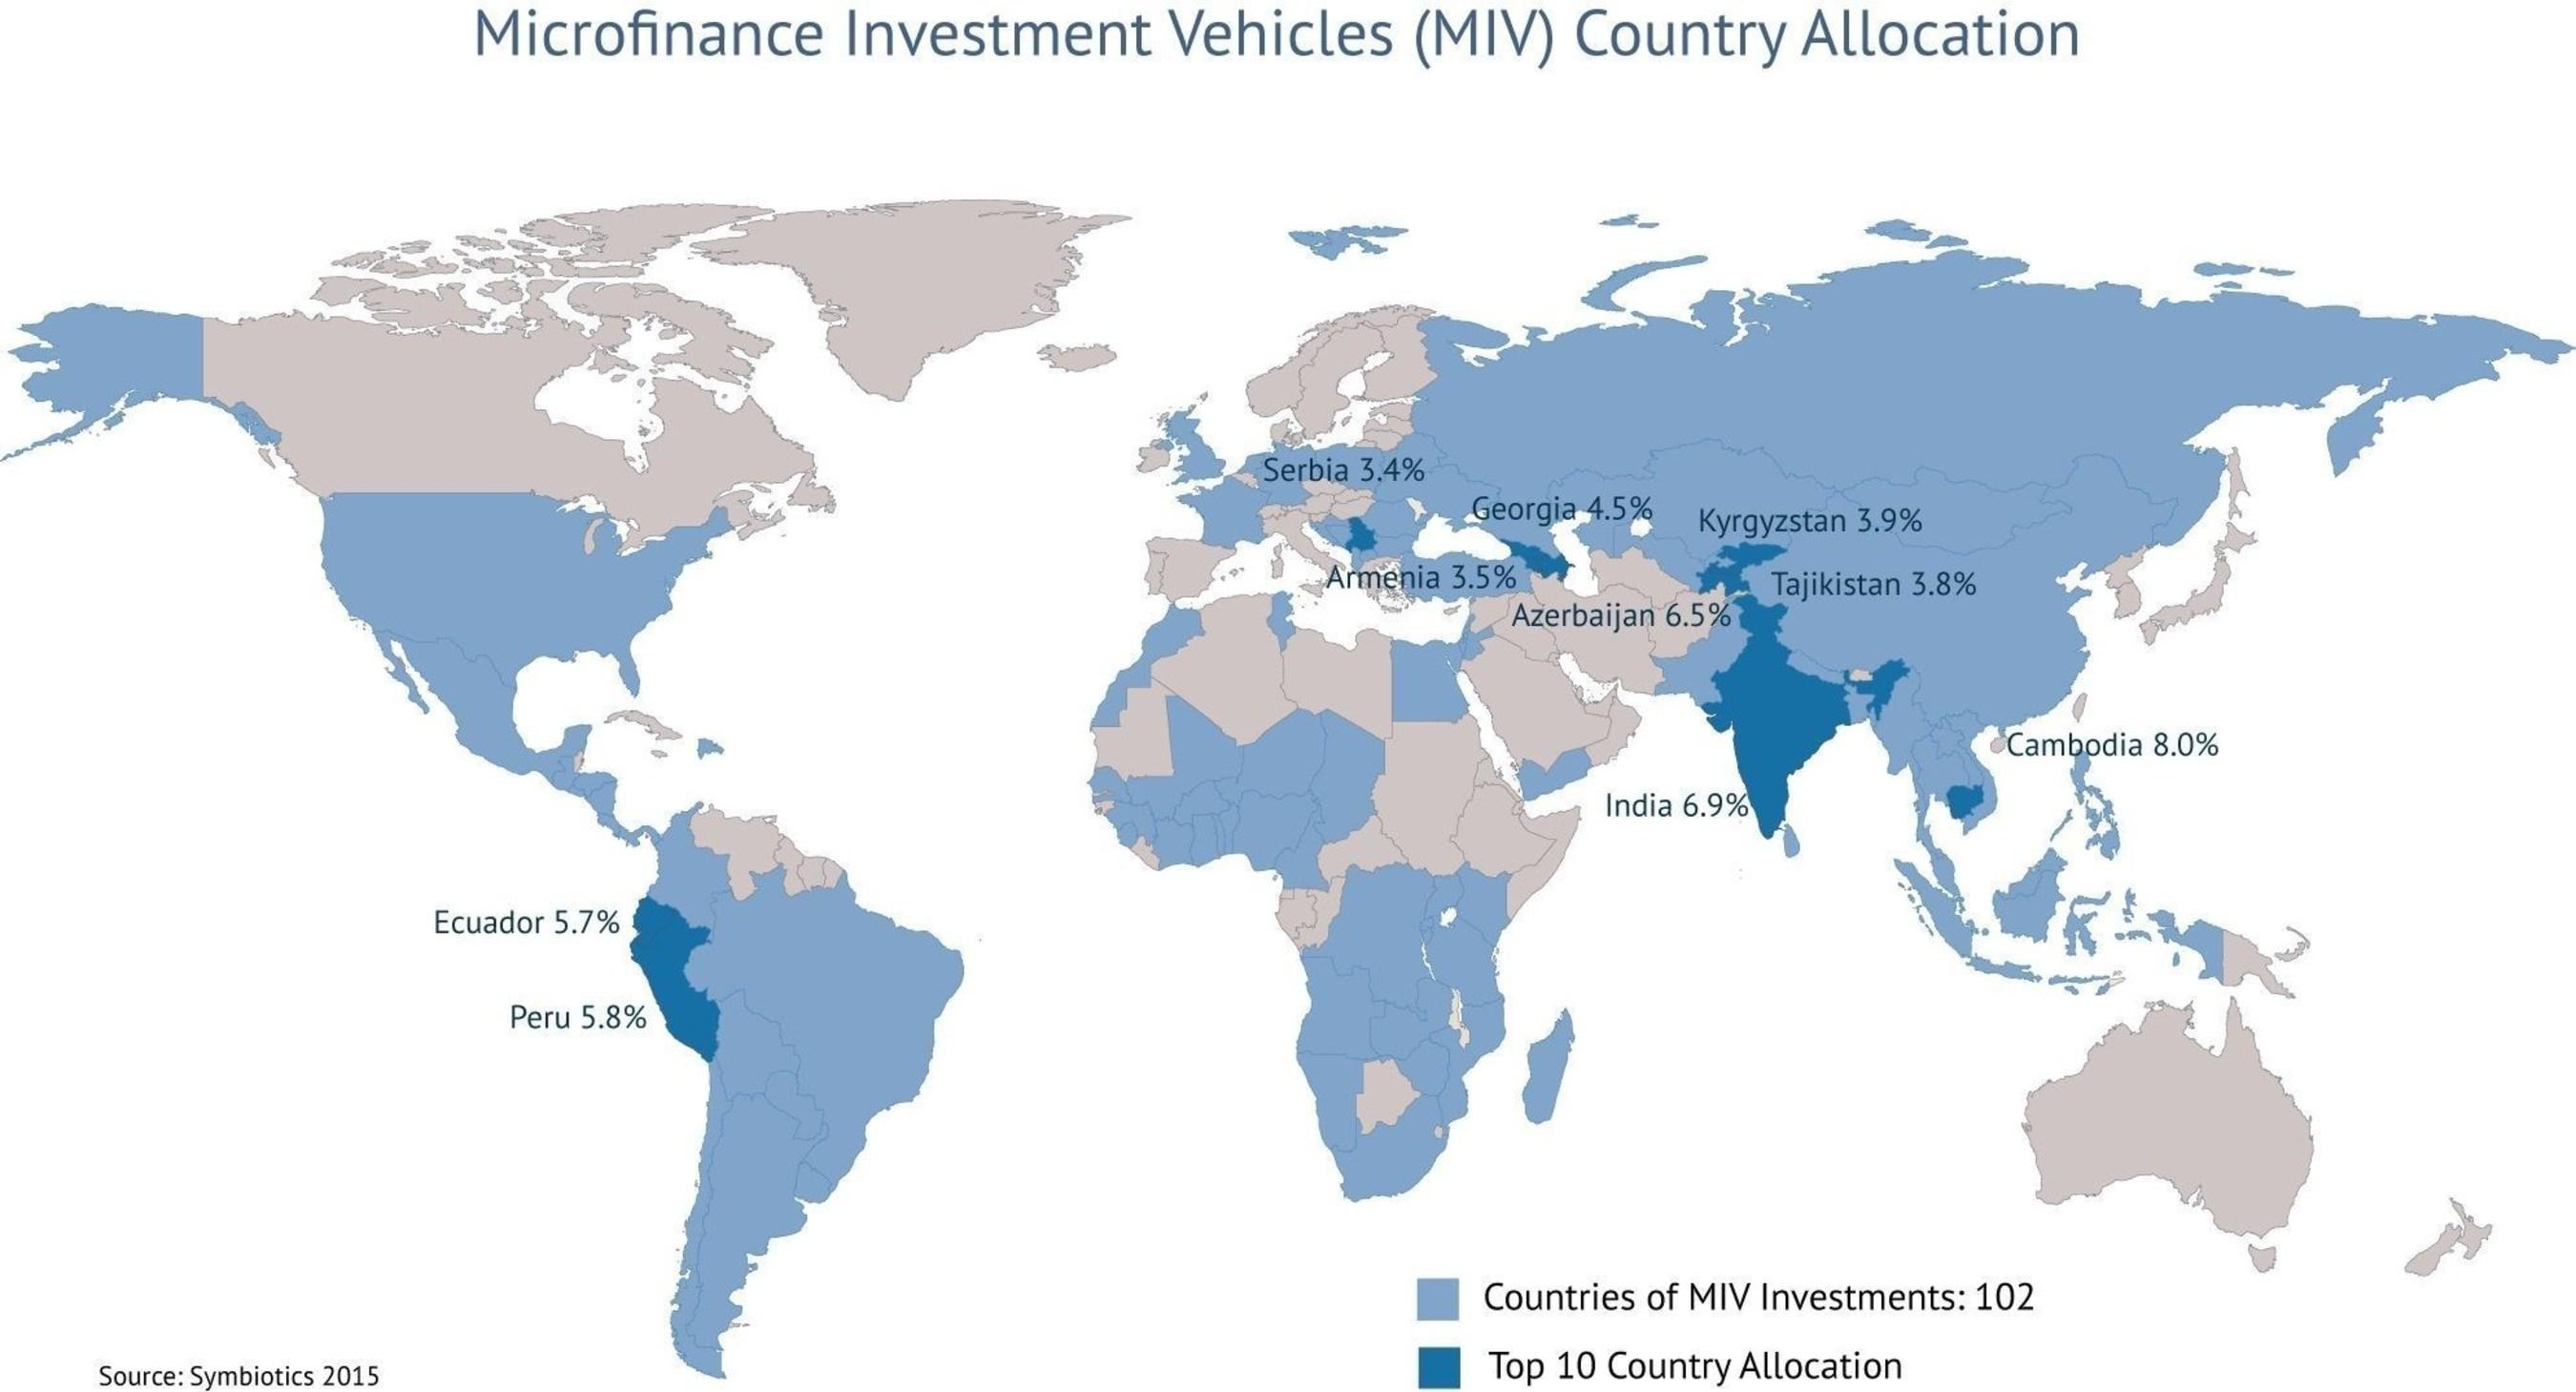 Symbiotics 2015 Study - Microfinance Investment Vehicles (MIV) Top 10 Country Allocation ...